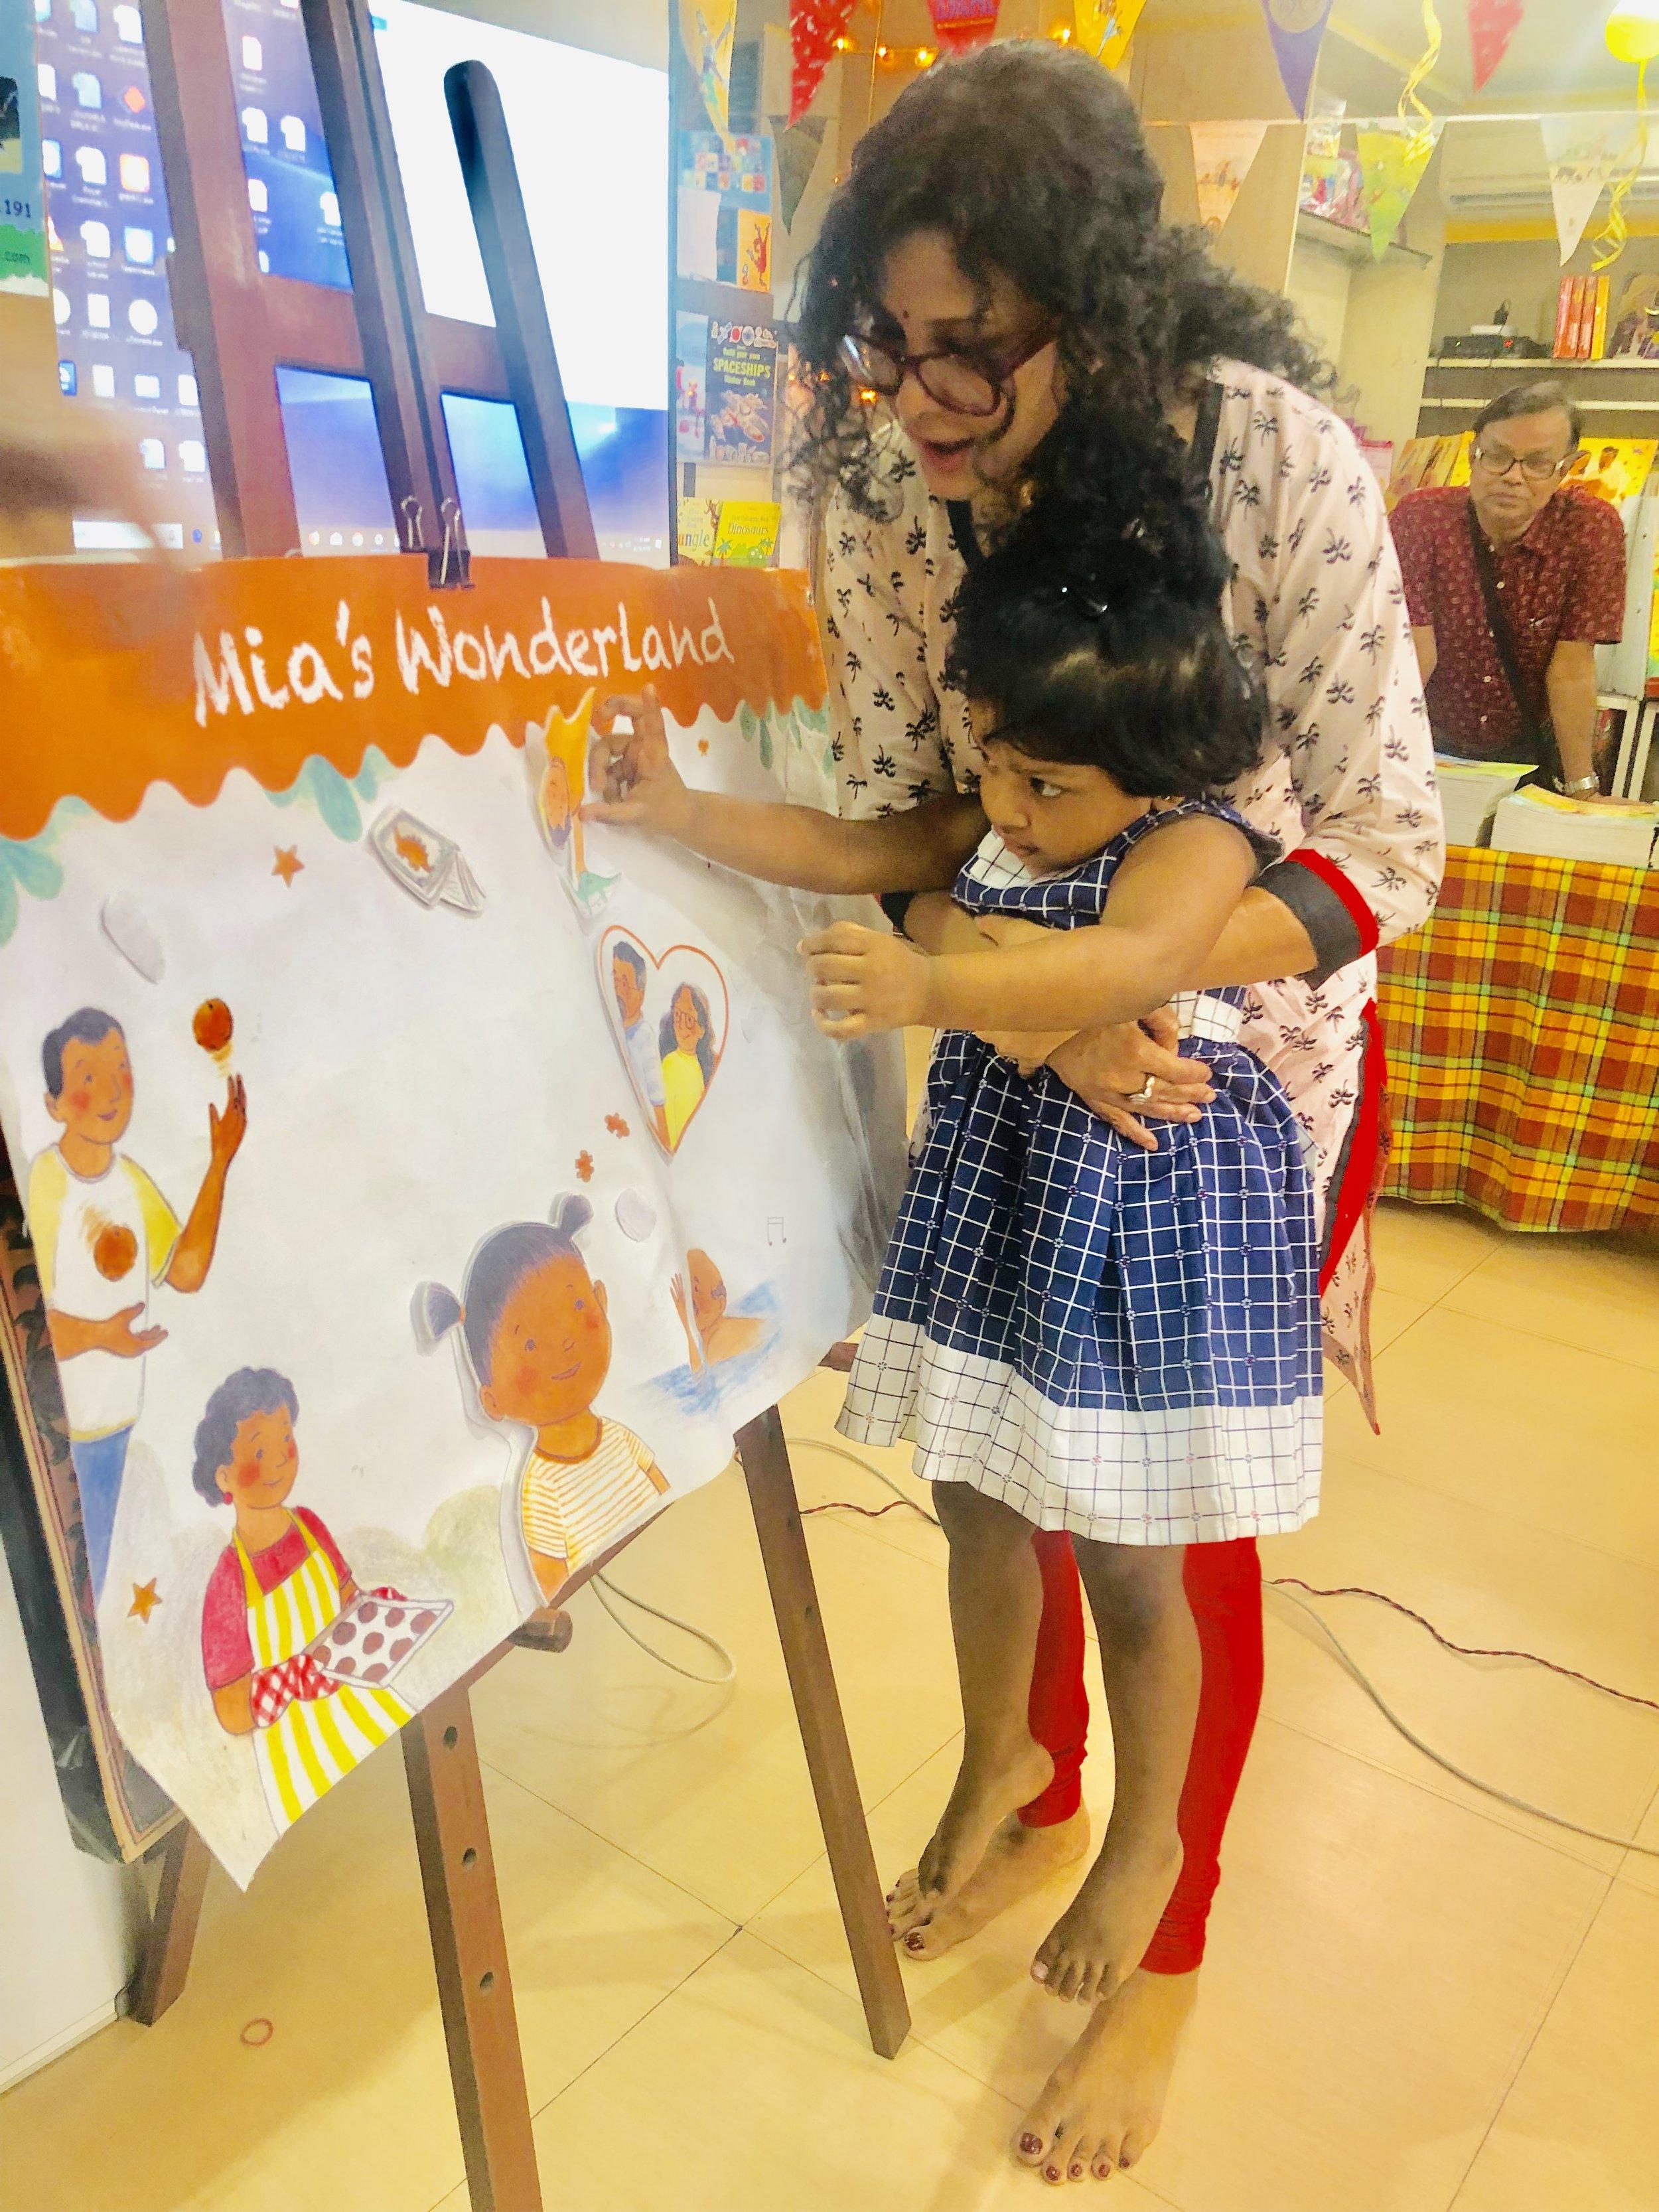 Oxford Subscription Book Club Interactive Storytelling Session, The Story Teller Bookshop, Kolkata, India  April 20, 2019